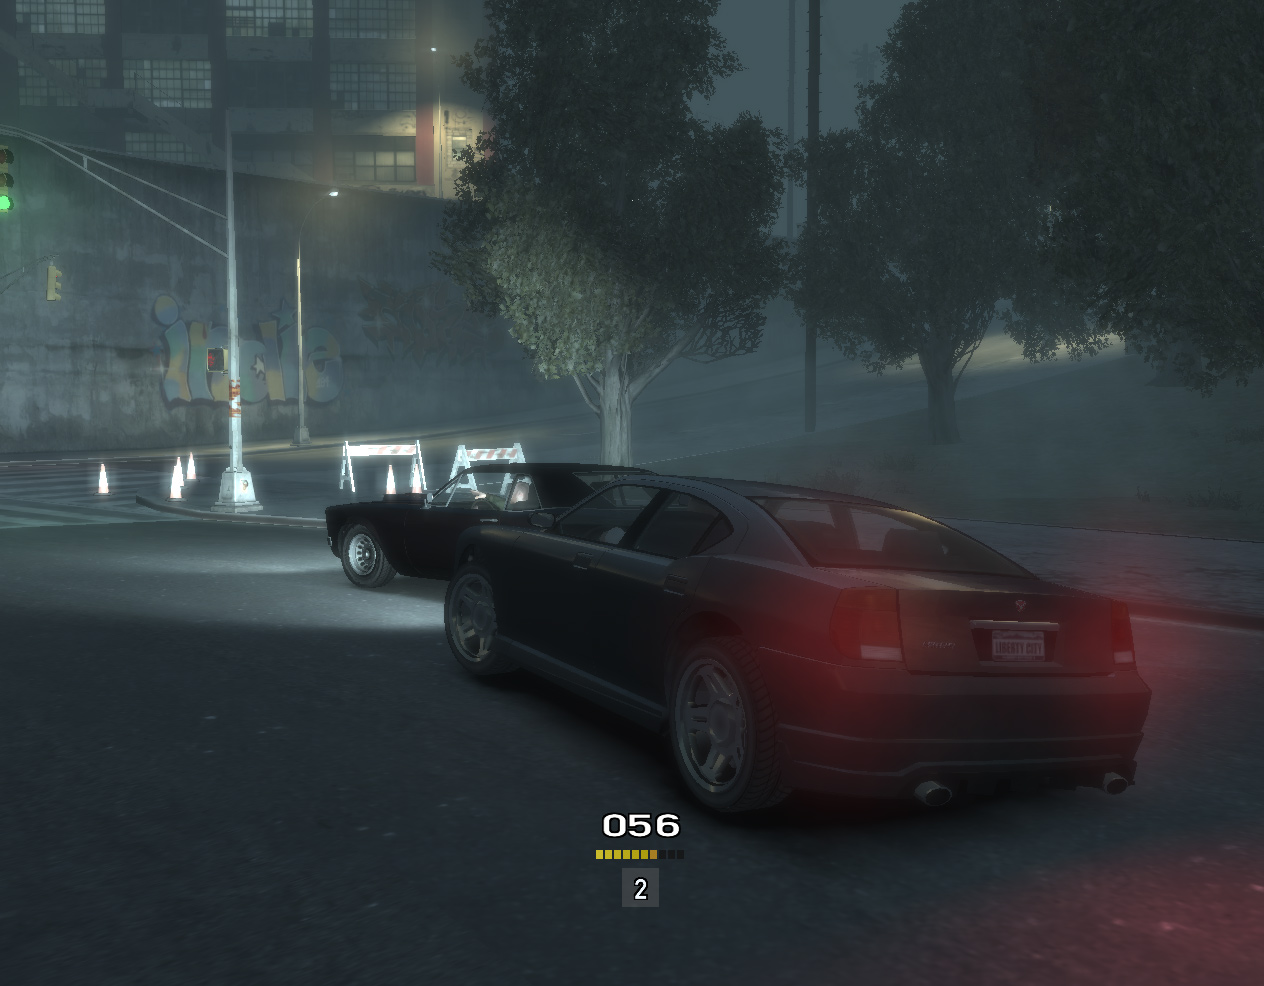 gta gaming archive rh gta4 mods com gta iv manual transmission mod gta 4 manual transmission mod 1.0.7.0